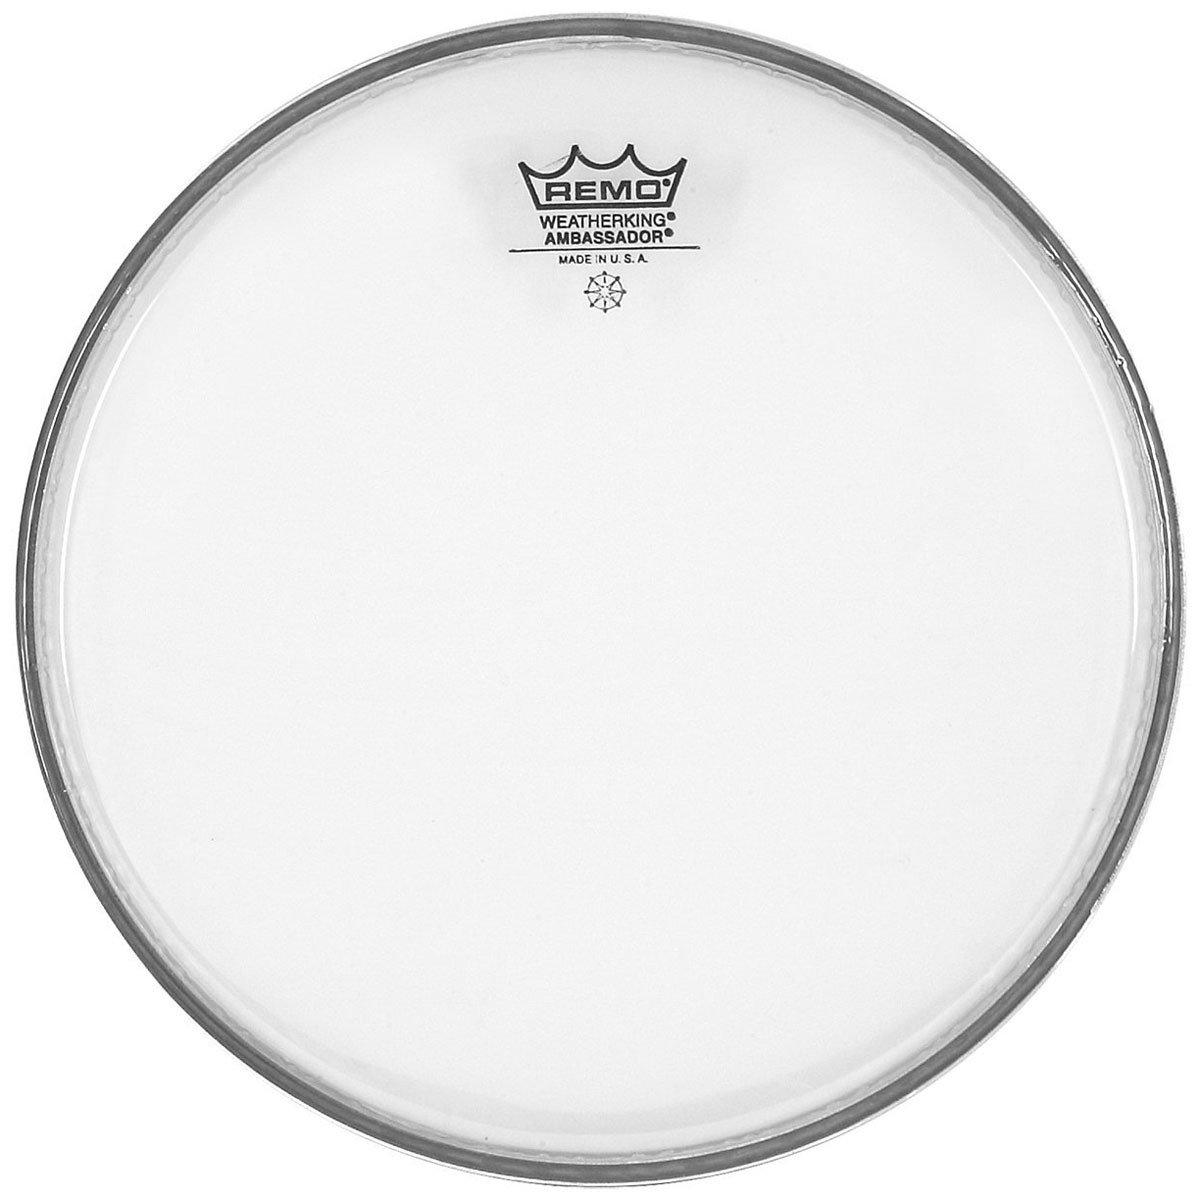 Remo 15 Weather King Ambassador Snare